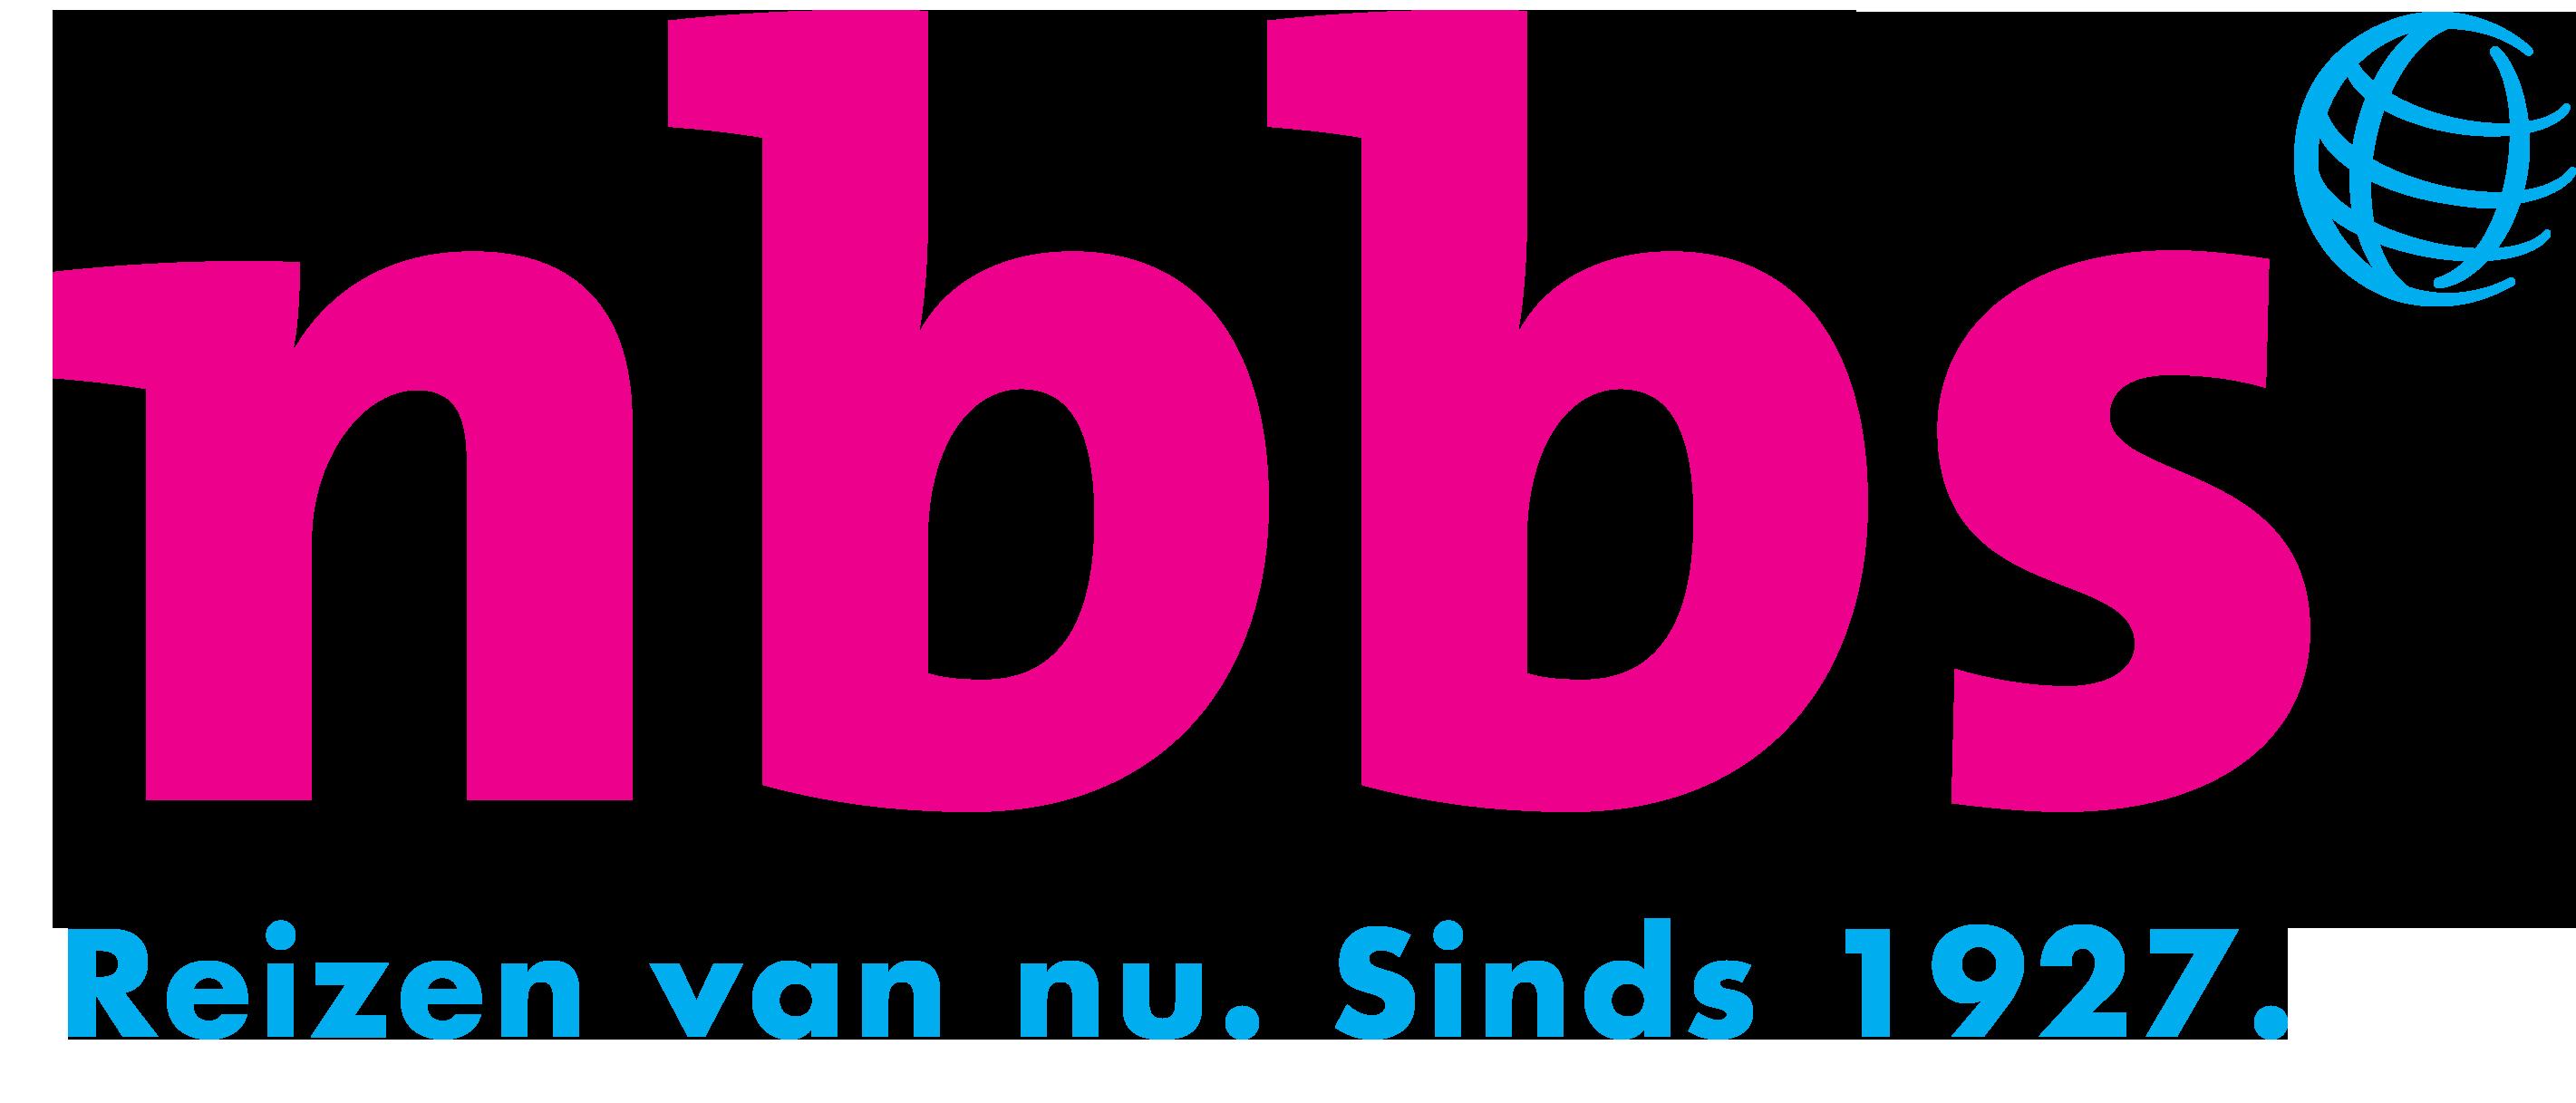 logo nbbs